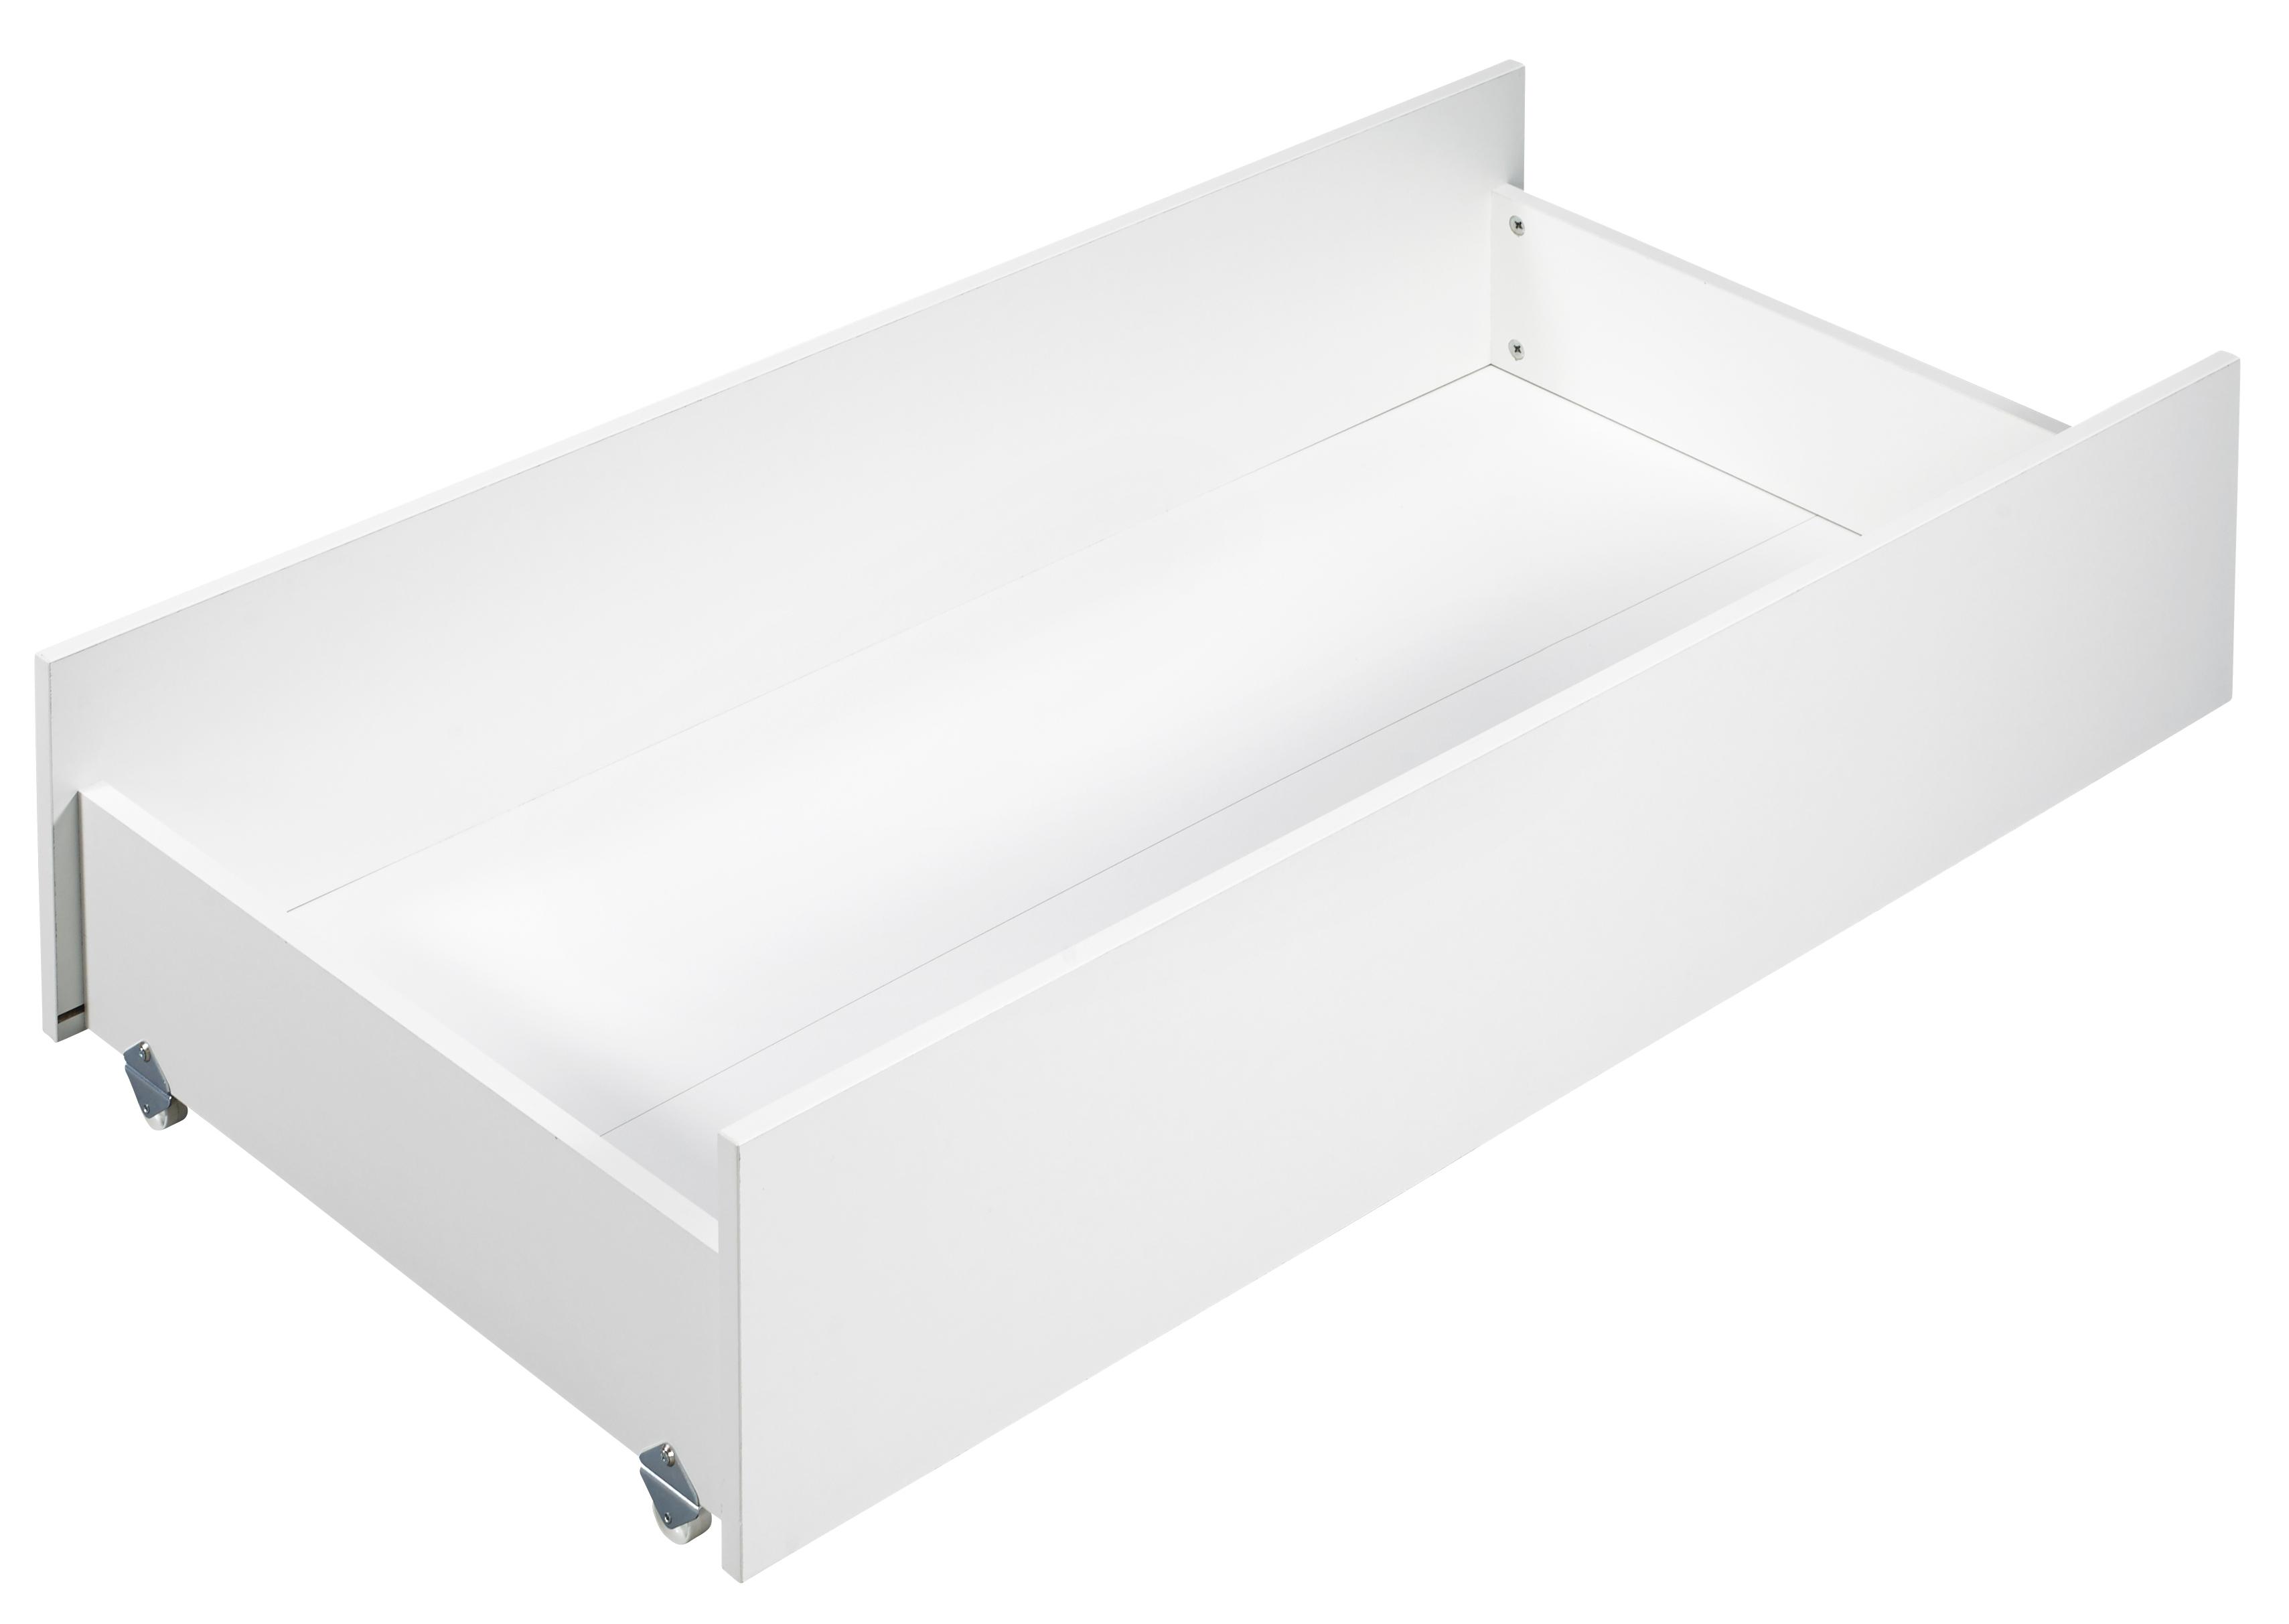 Cool tiroir pour lit bb combin volutif winnie floaty day x - Chambre ana sauthon ...